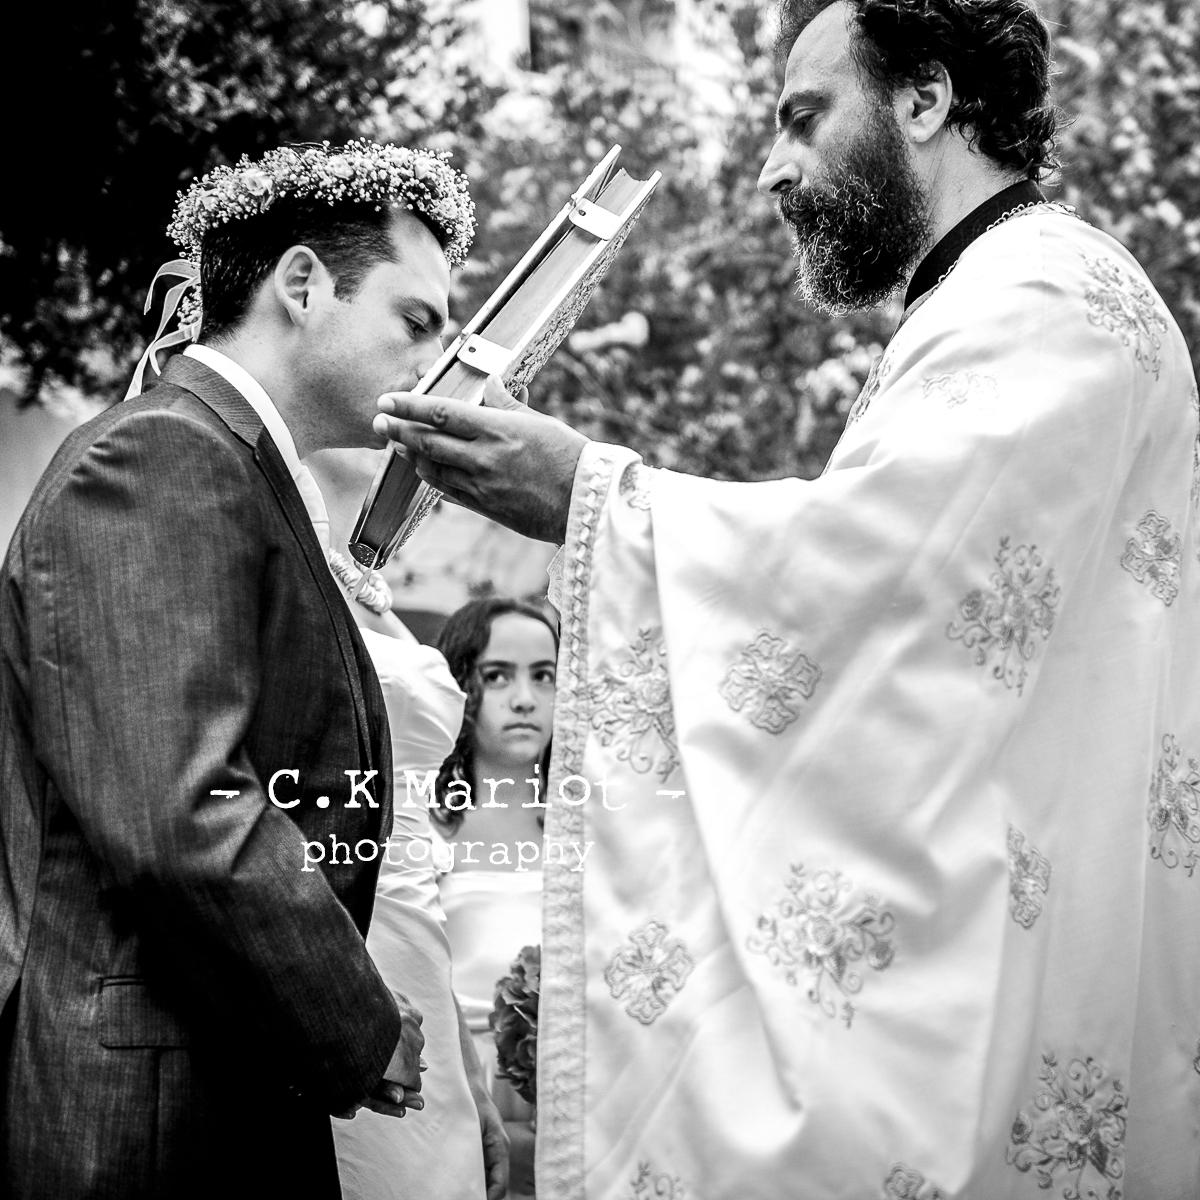 CK-Mariot-Photography-mariage- orthodoxe-crète-0408